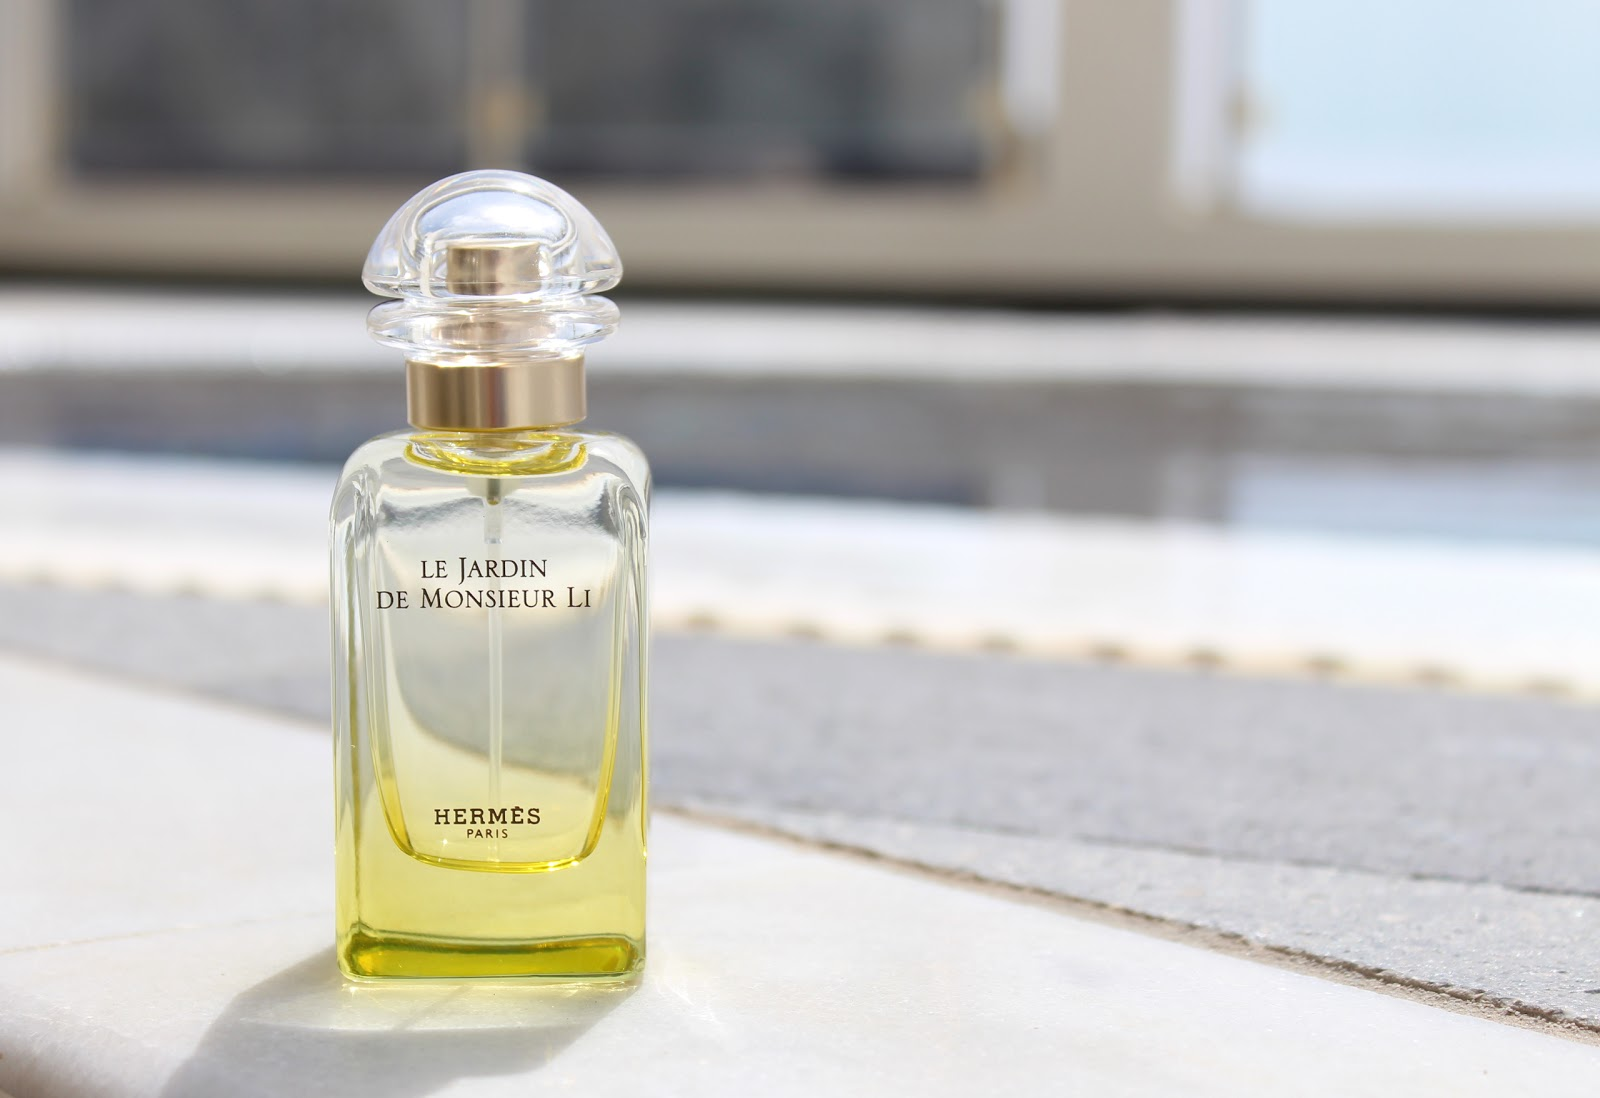 Hermes Le Jardin De Monsieur Li Fragrance